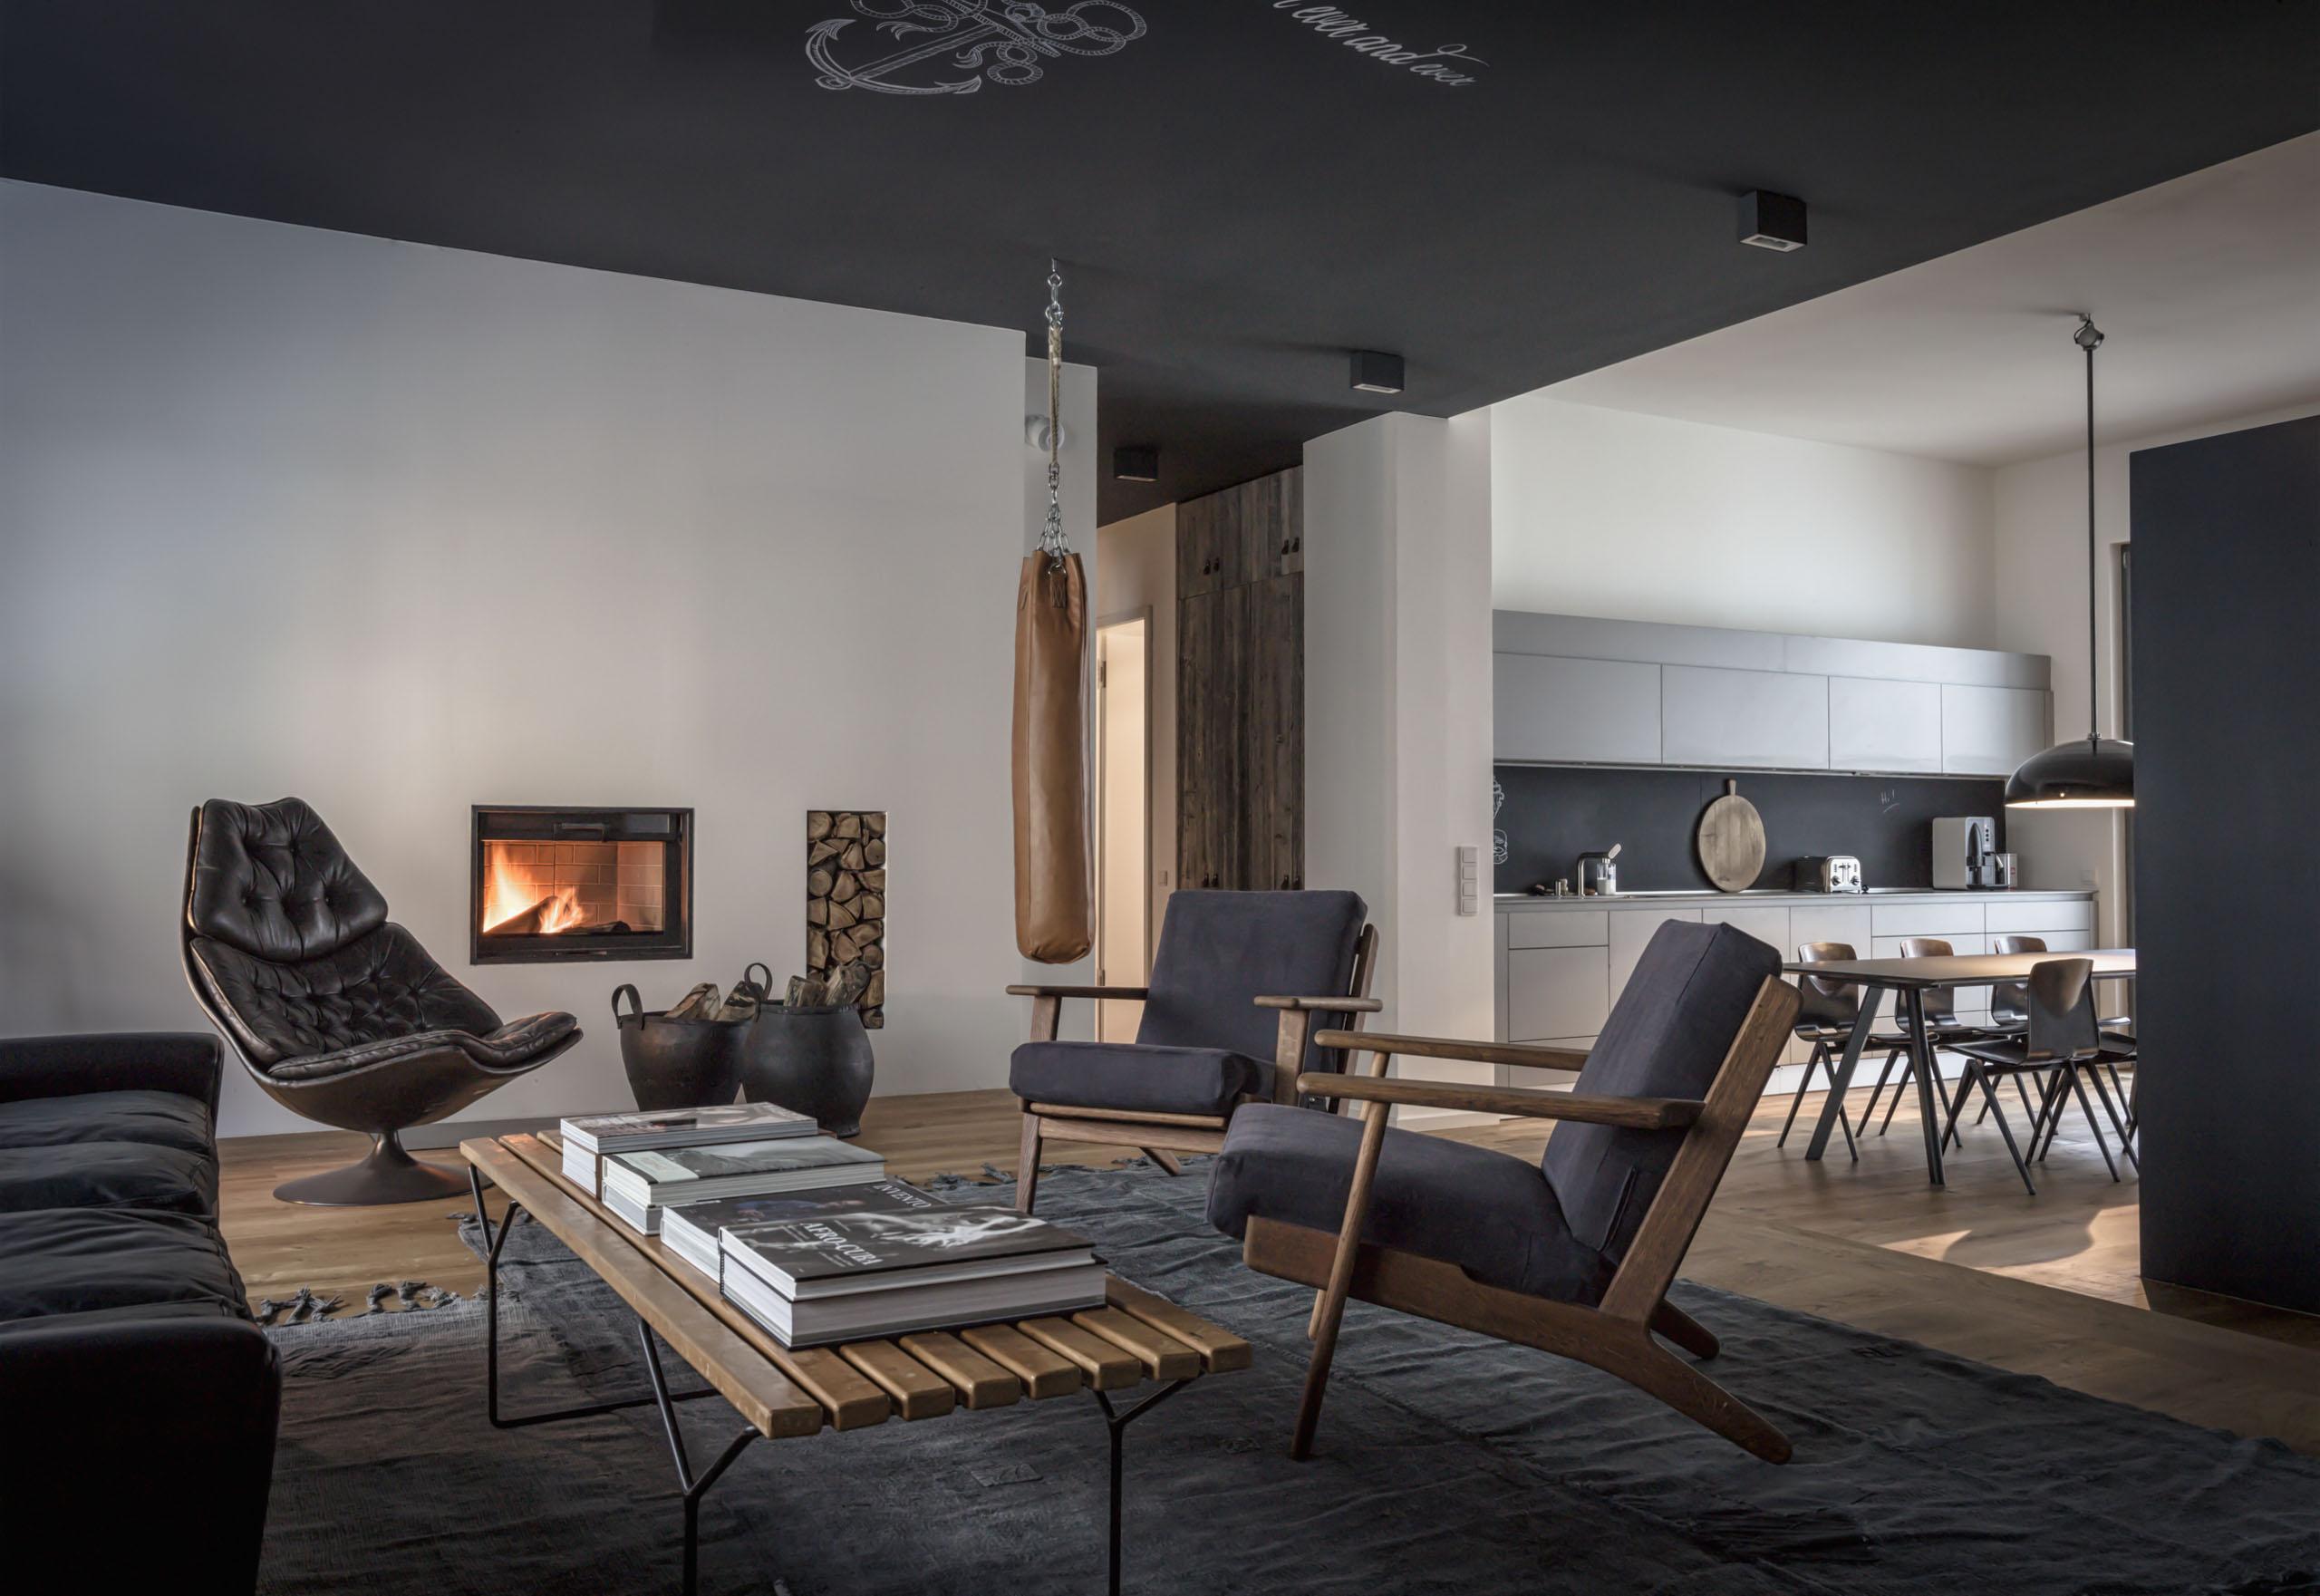 Suite.030: Suites und high class Apartments Berlin